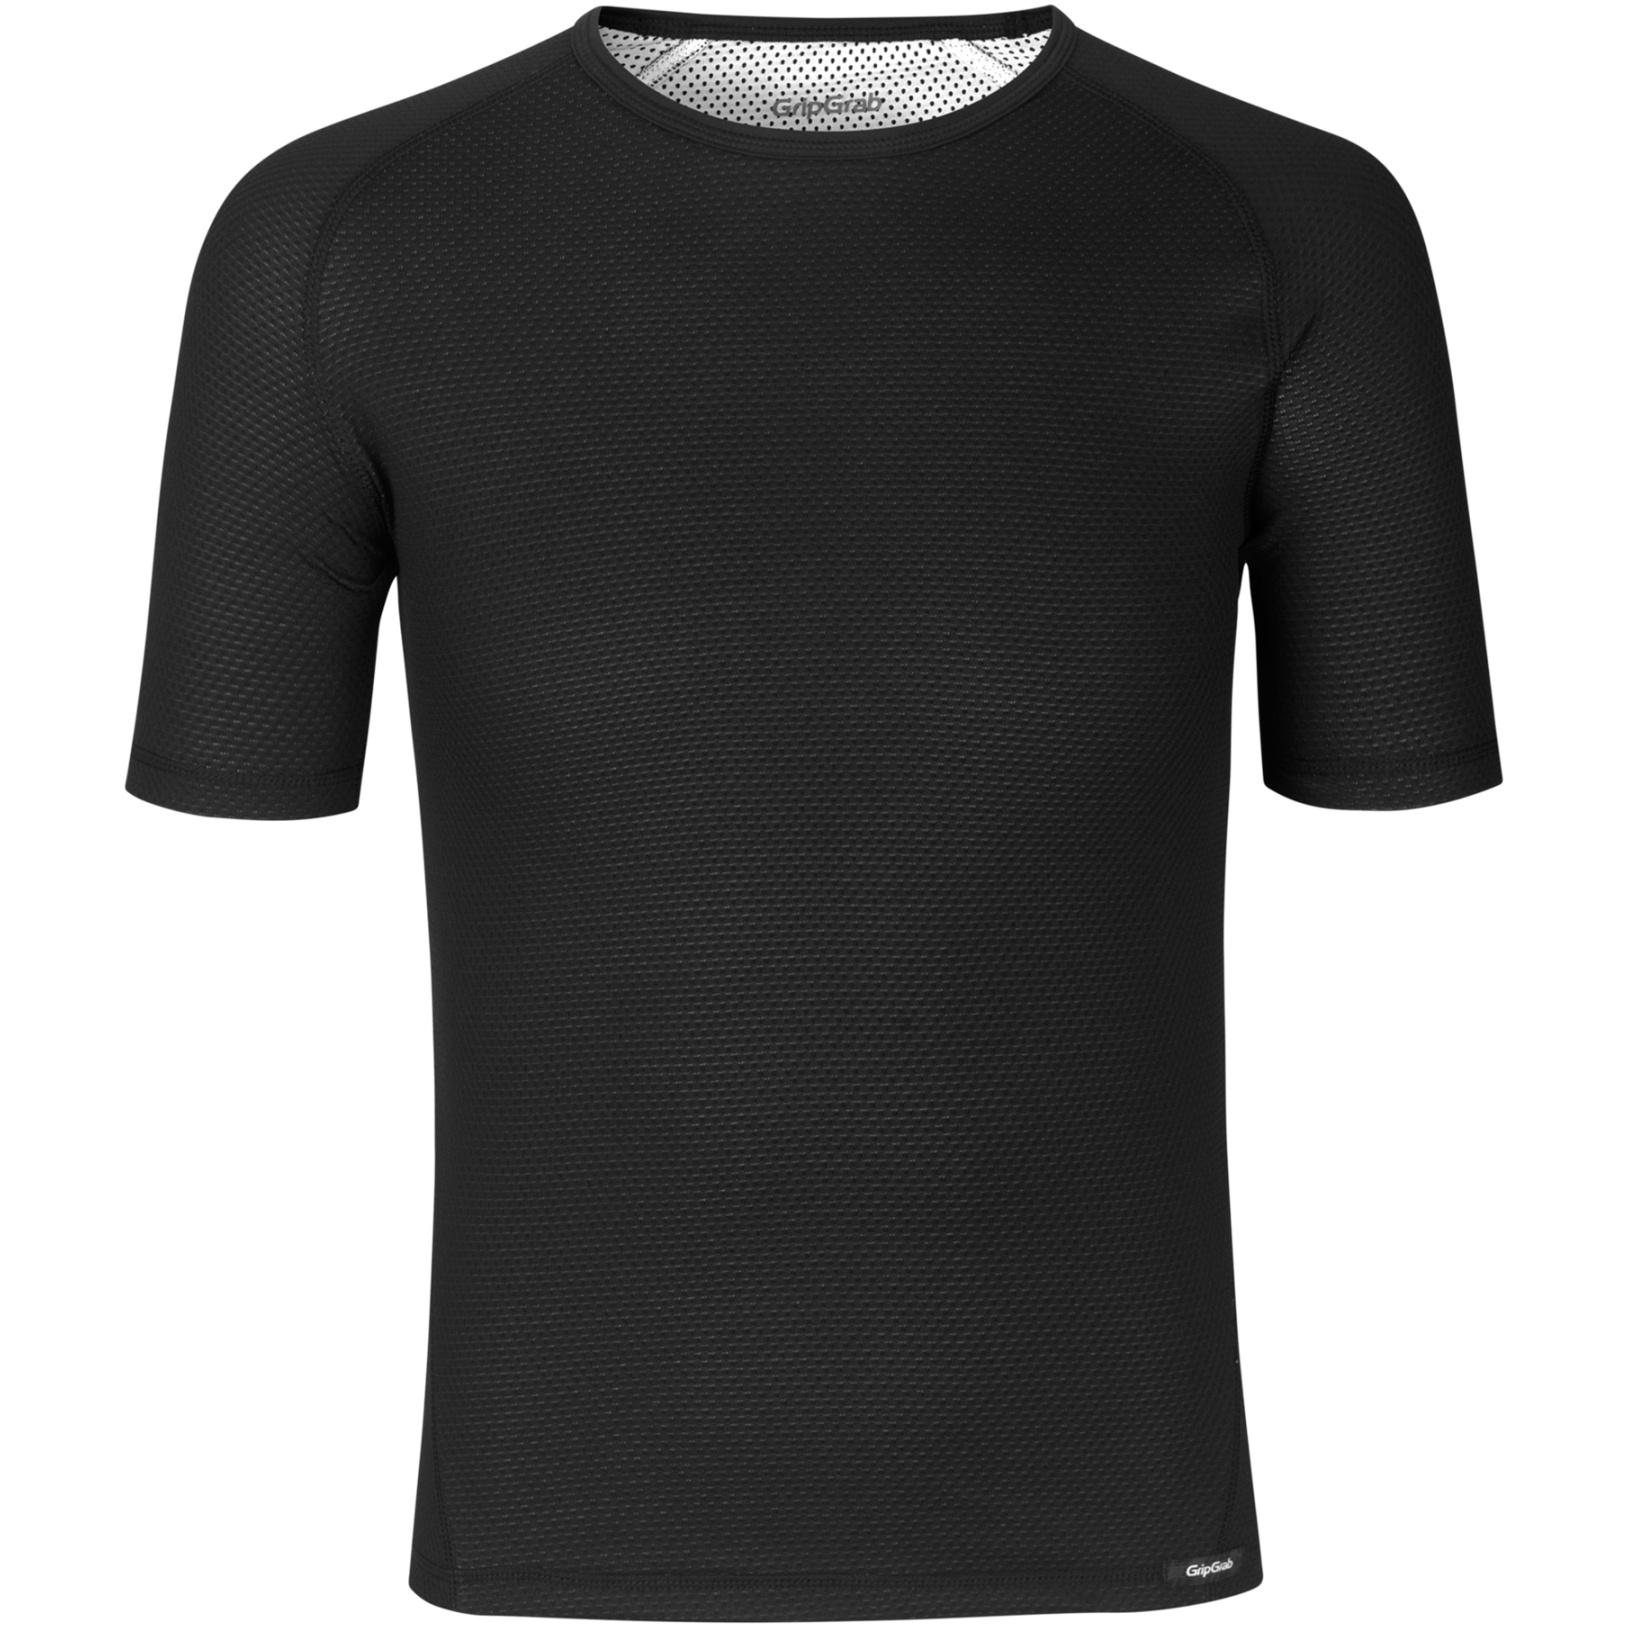 GripGrab Ride Thermal Short Sleeve Base Layer - black